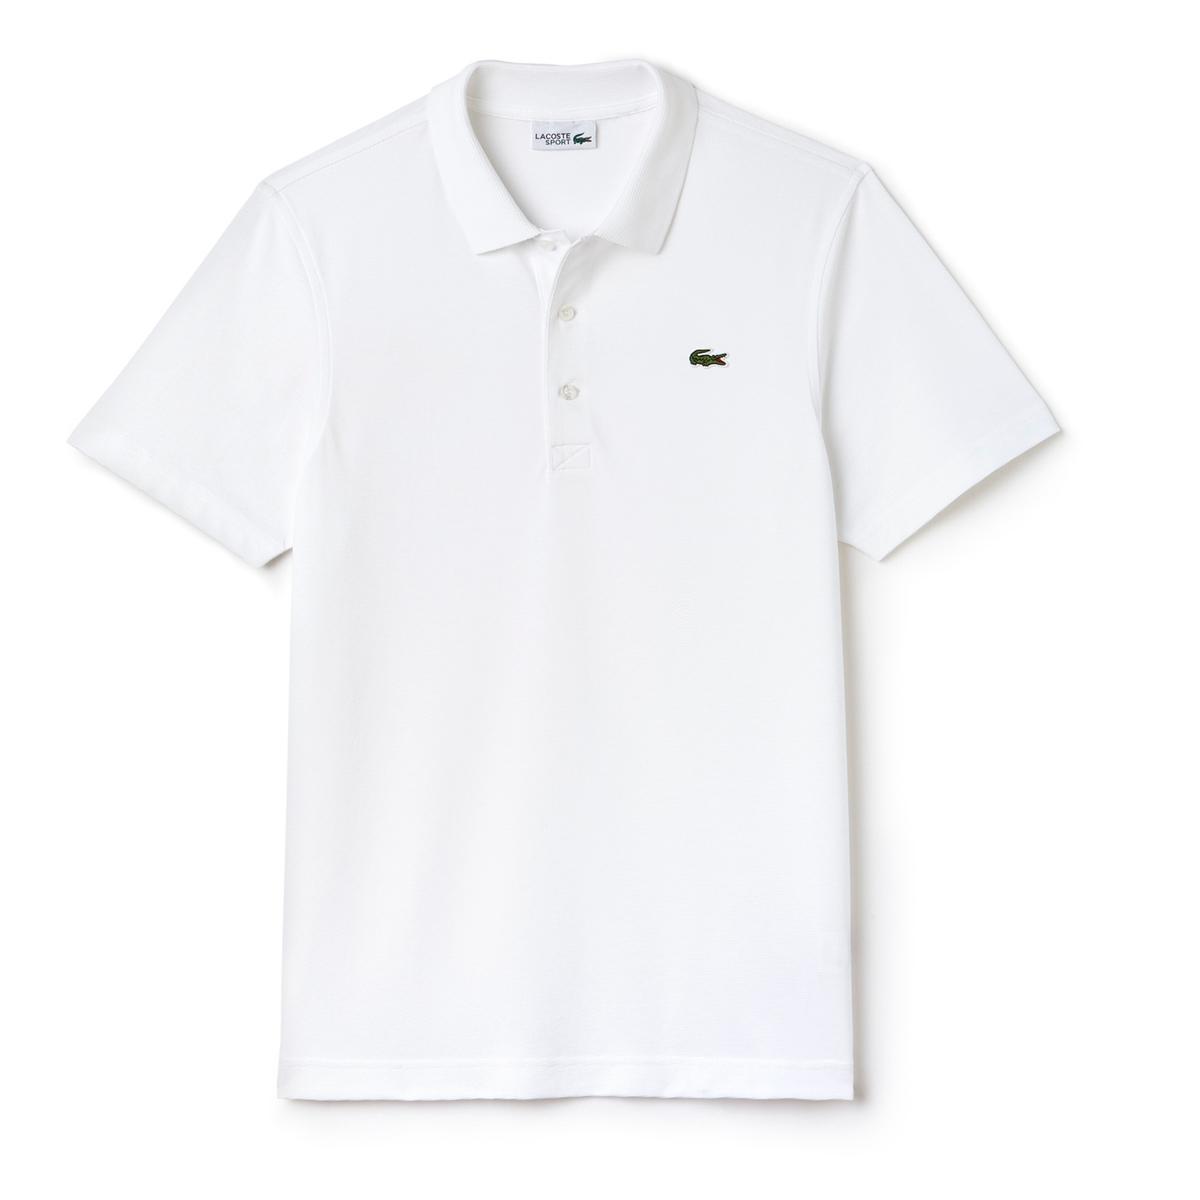 Polo Sport L1230 bianca